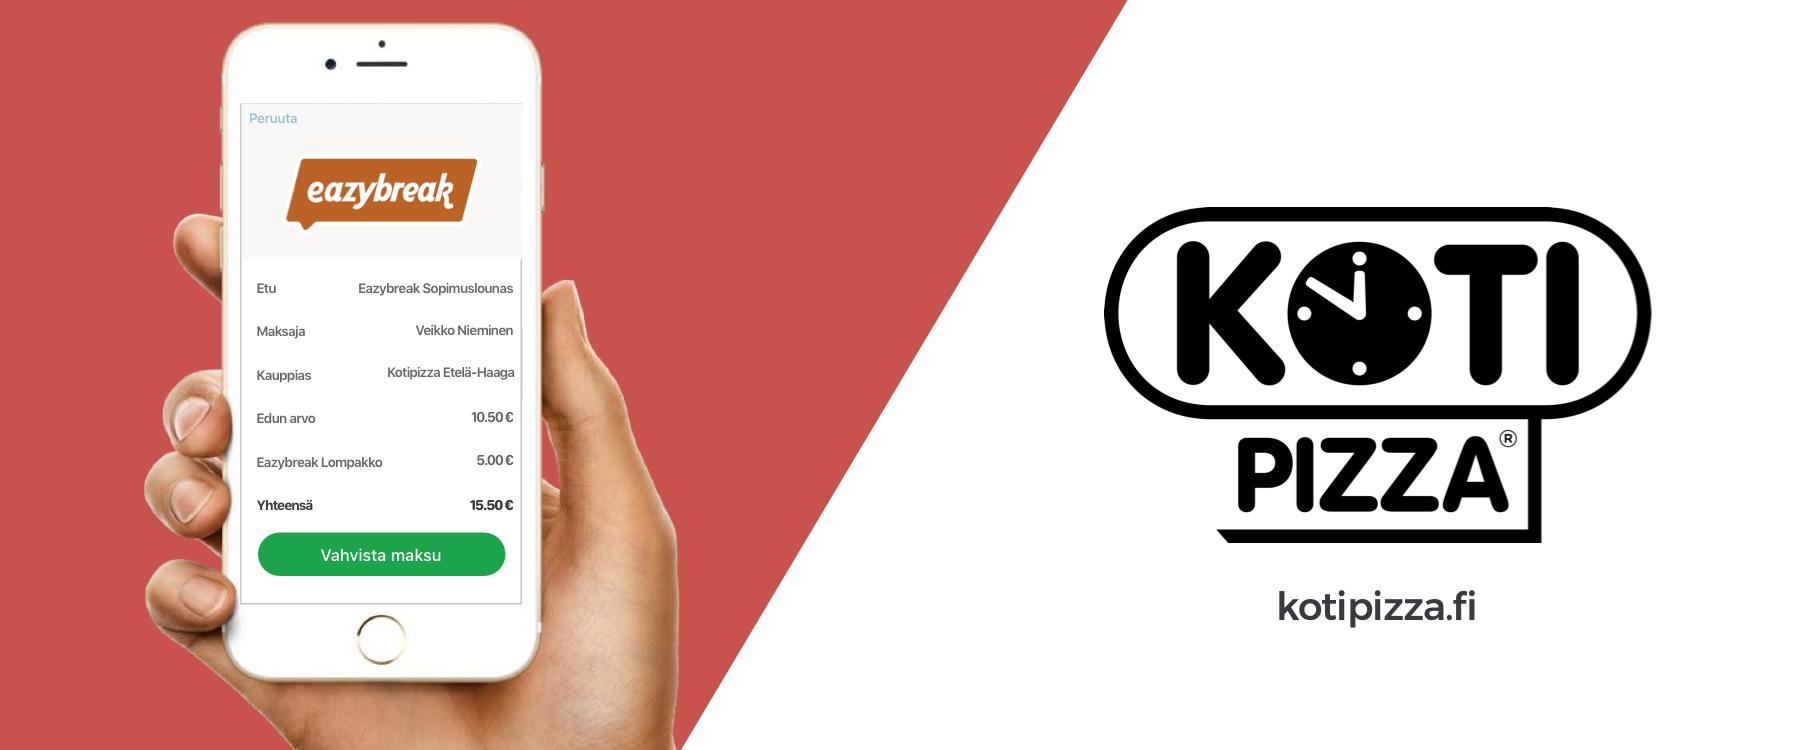 Kotipizza-verkkomaksu-blog-cover-2.png